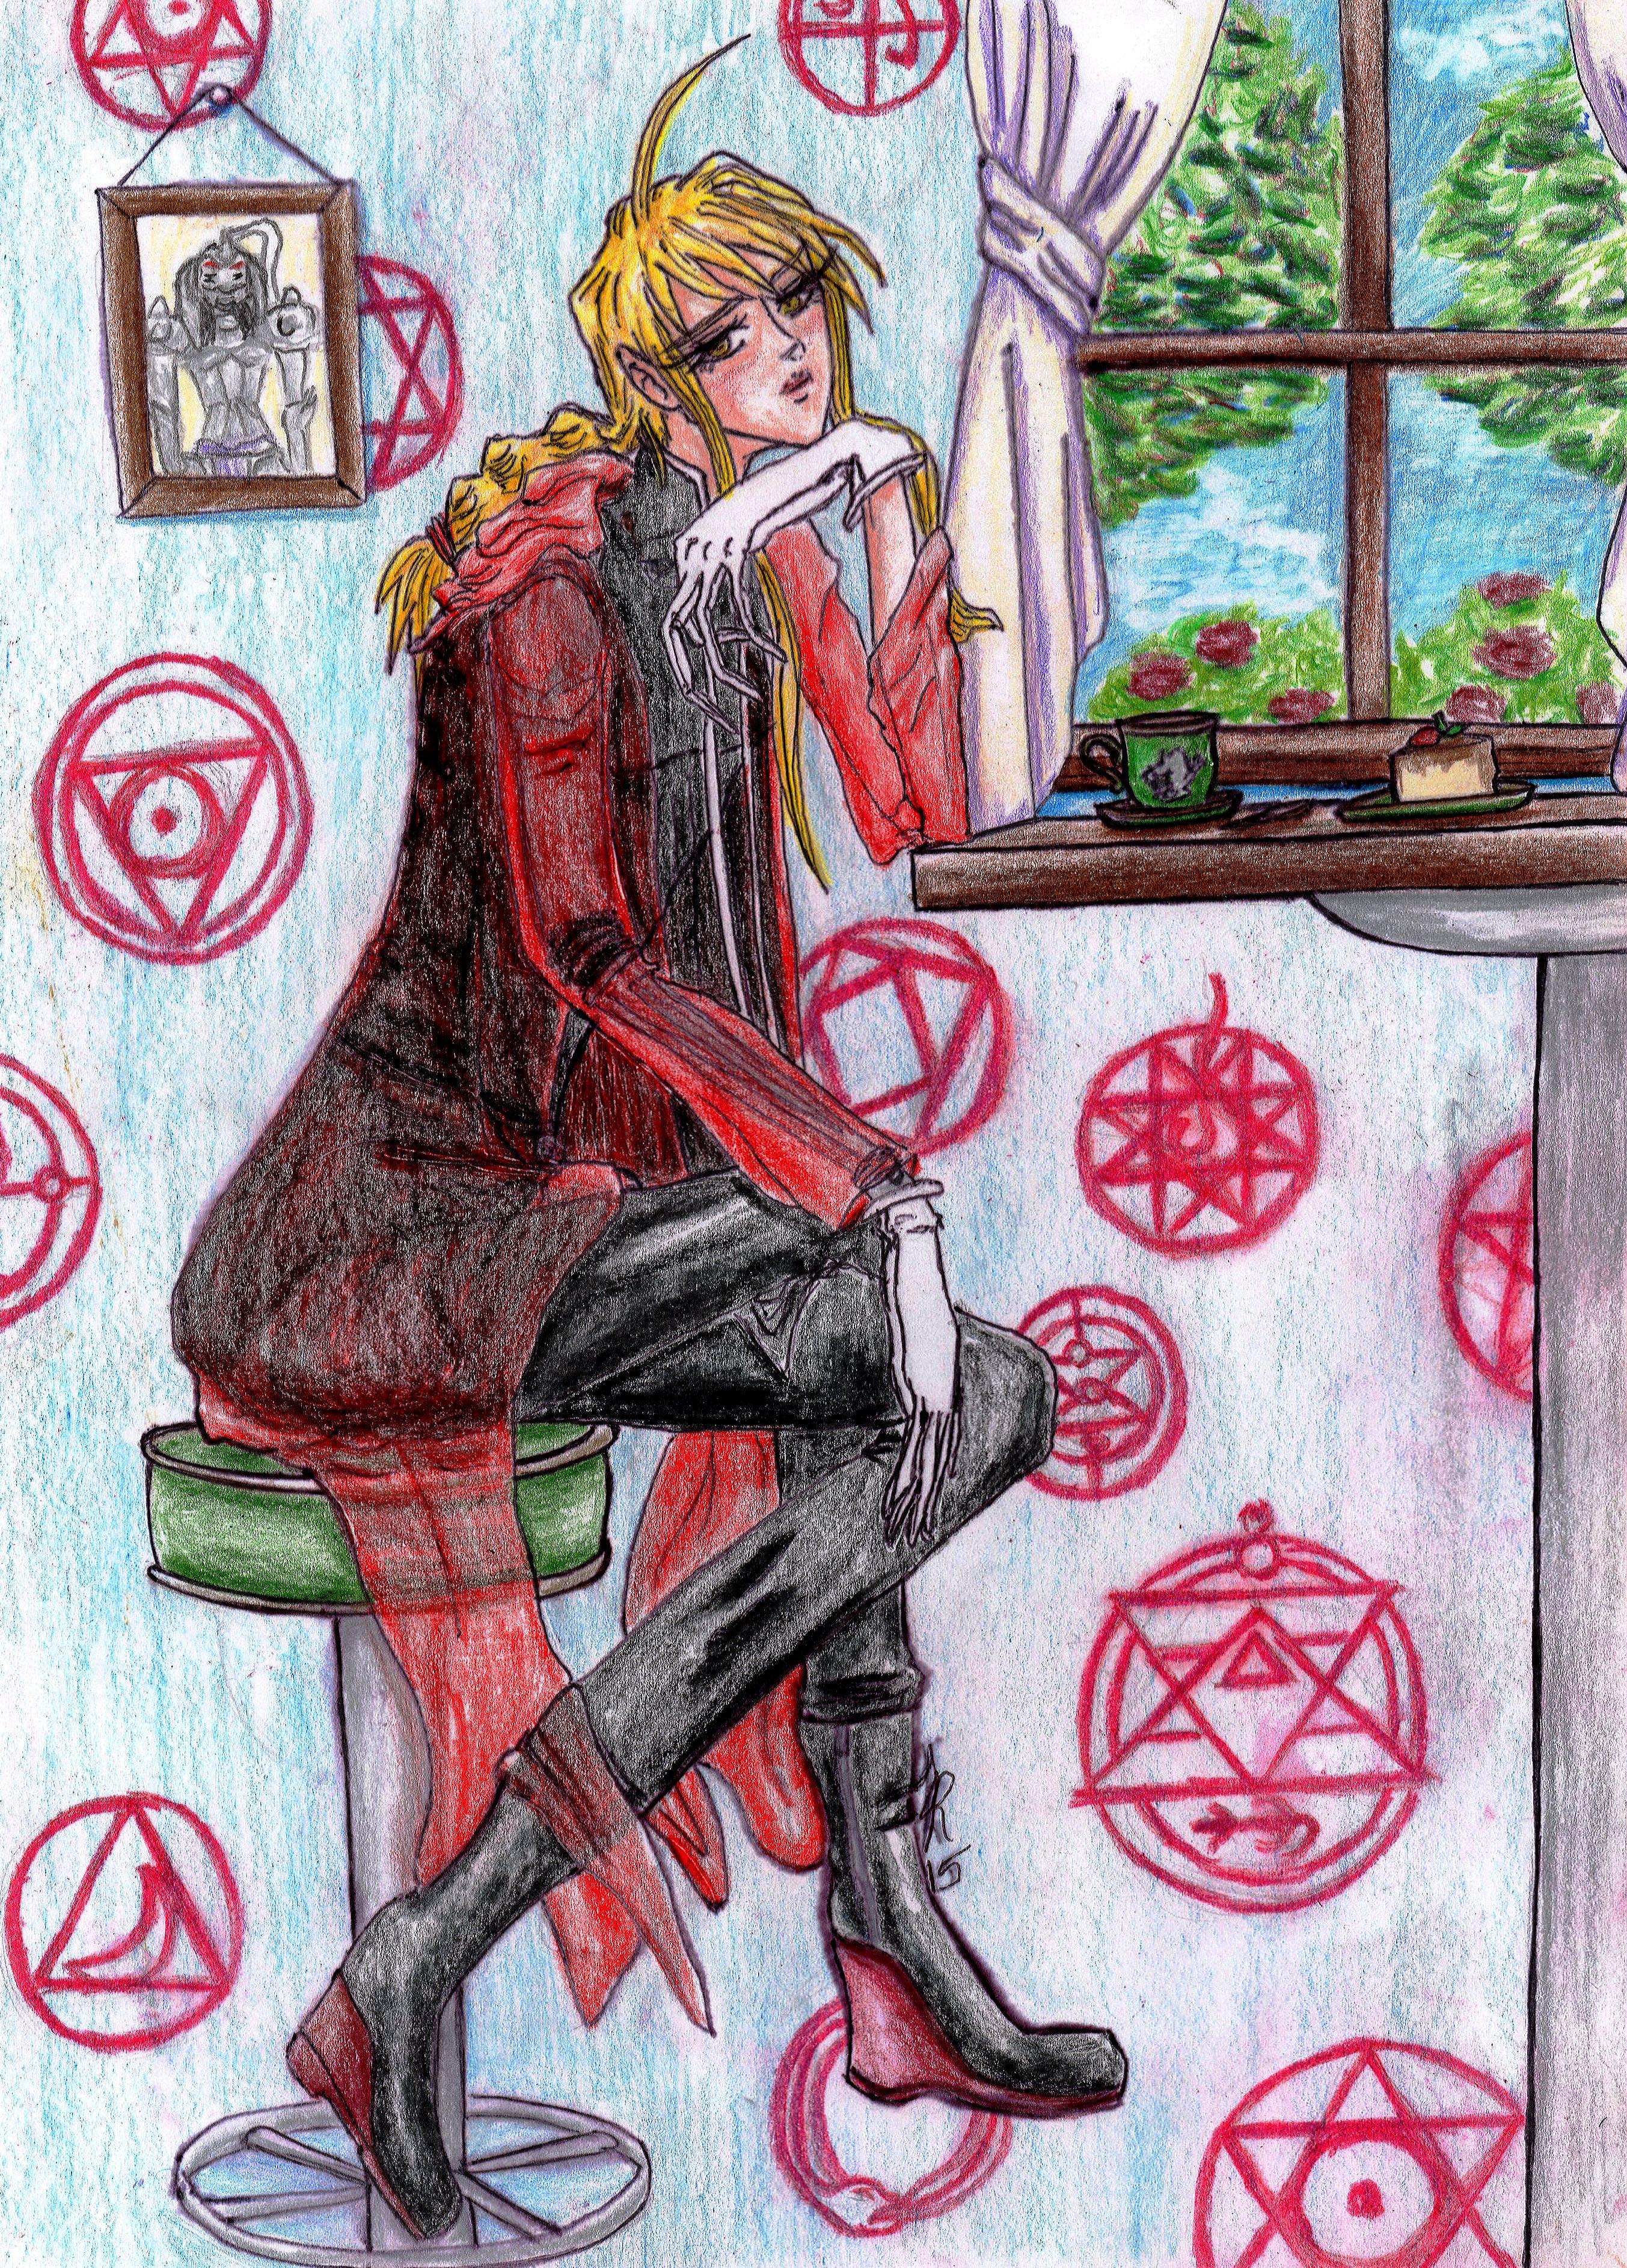 Femme Edward Elric